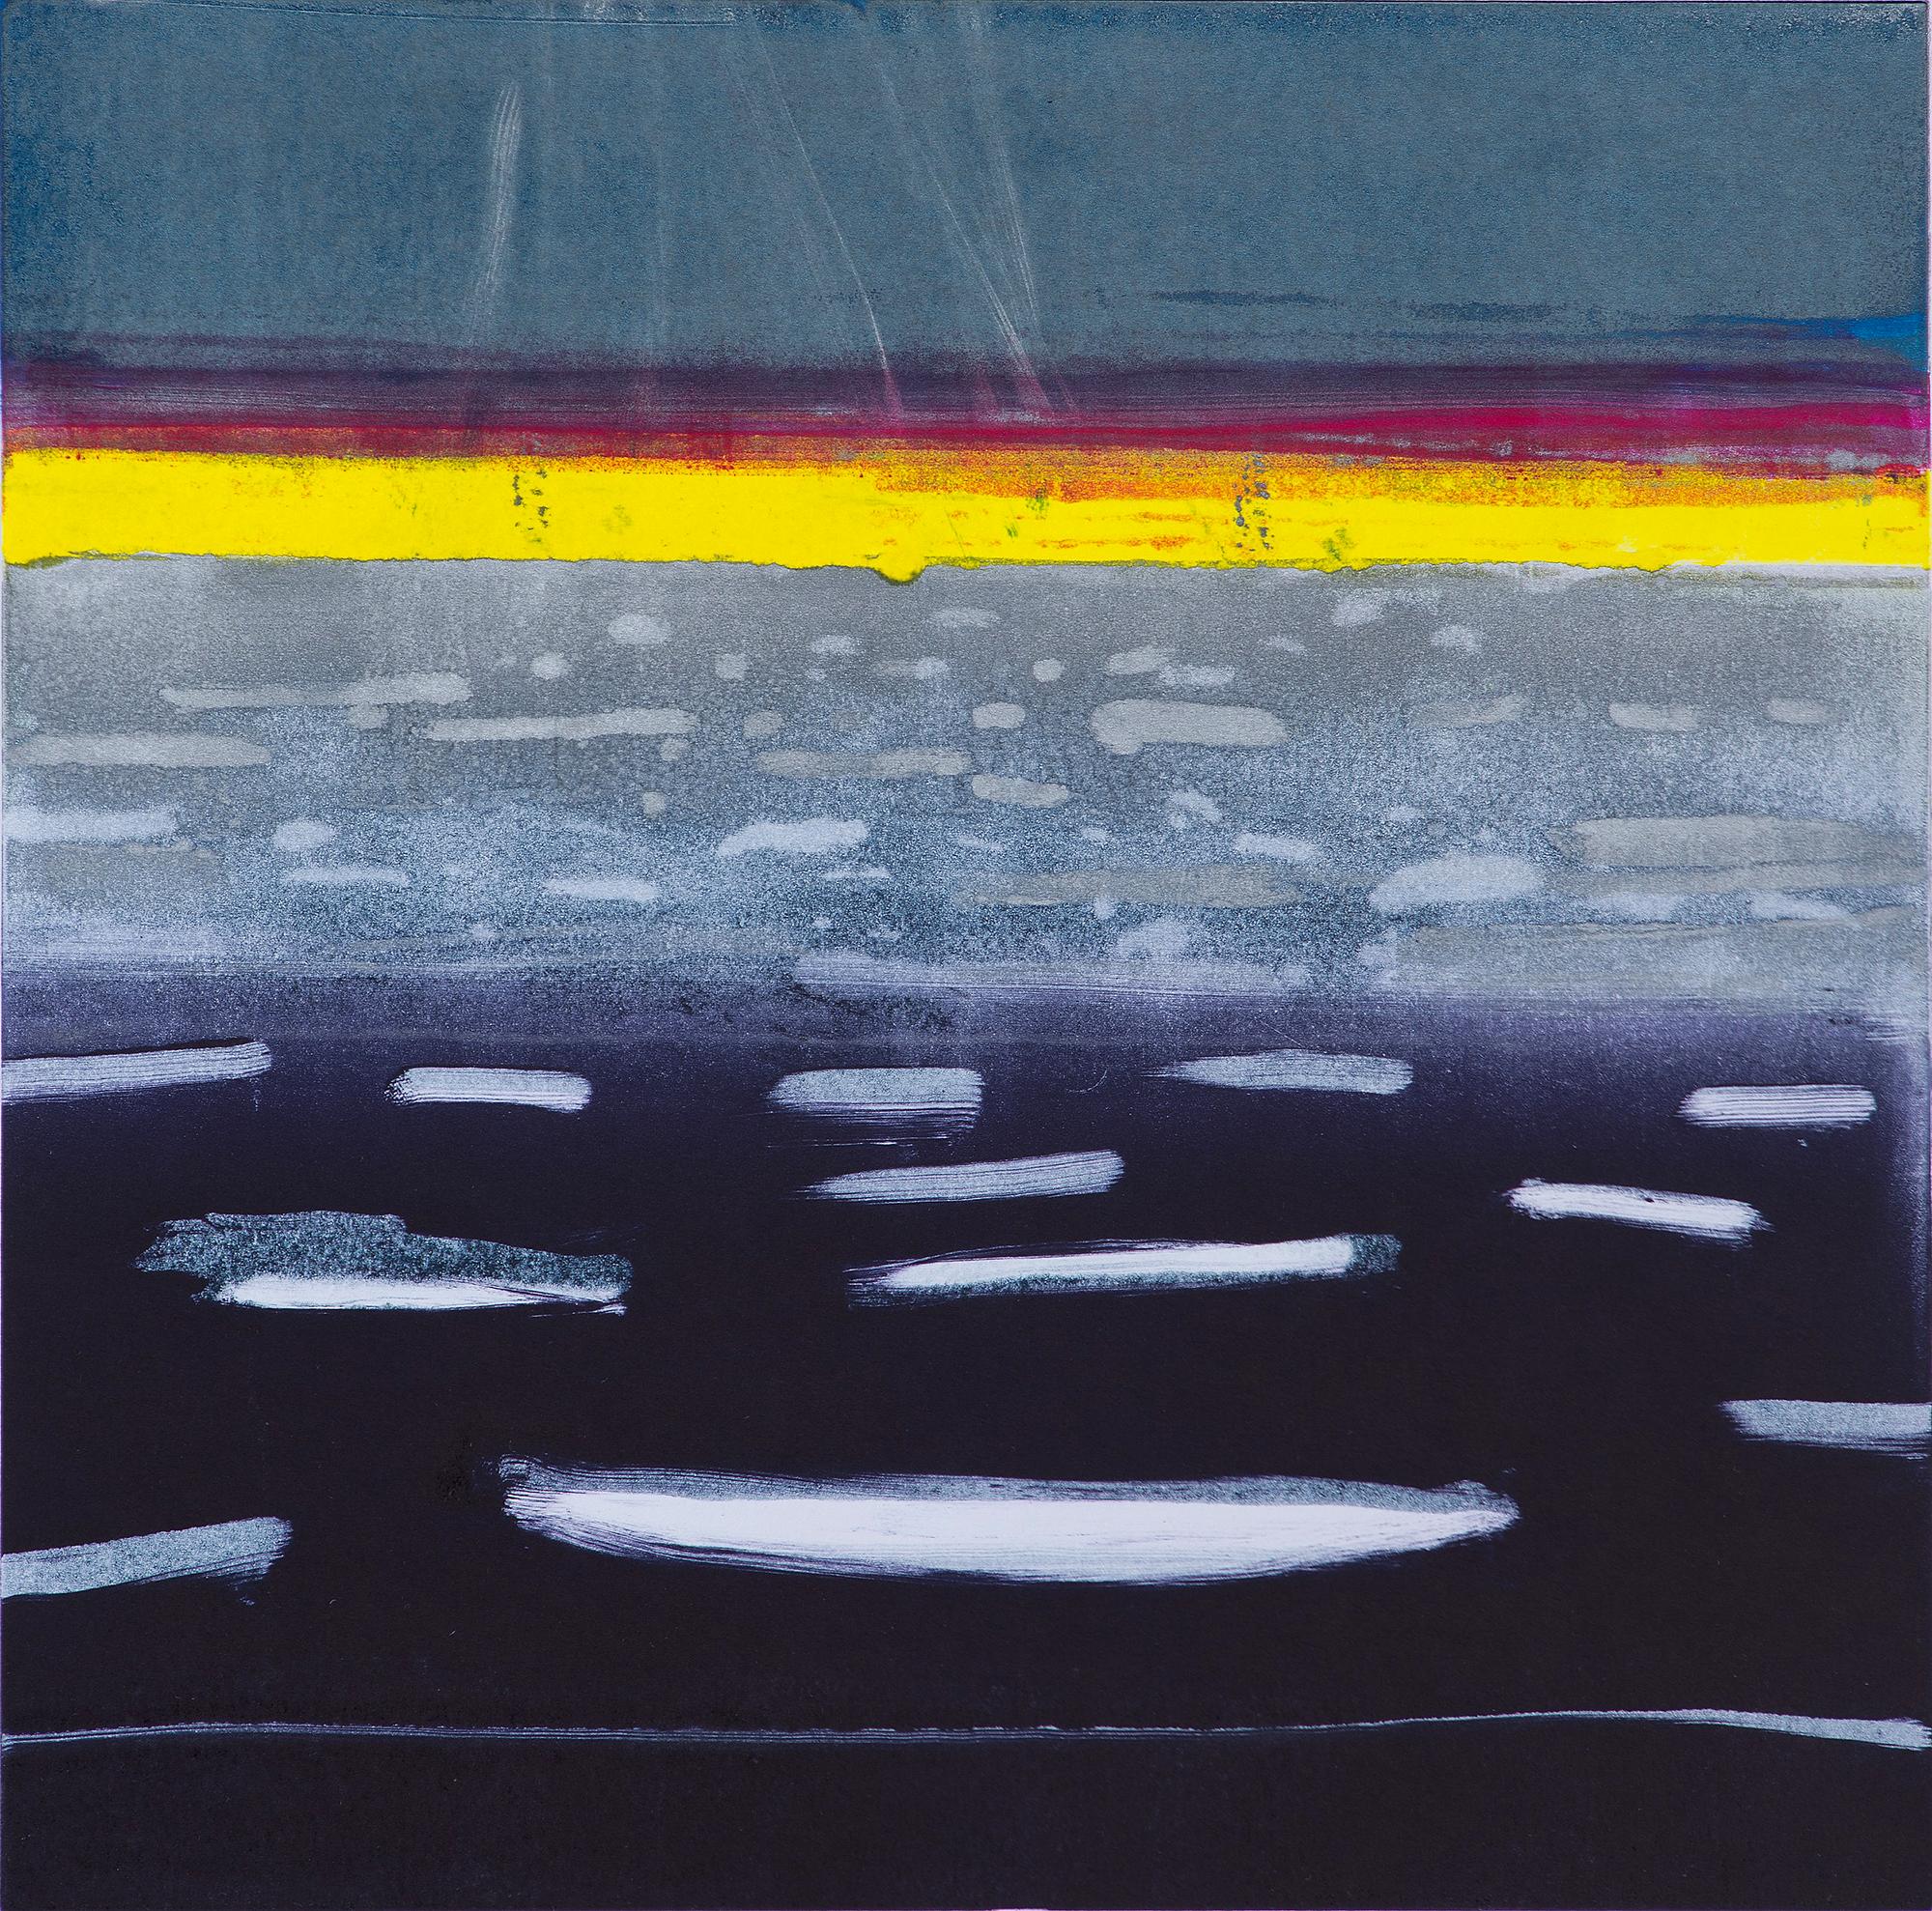 Dark Sea – Peel Sound